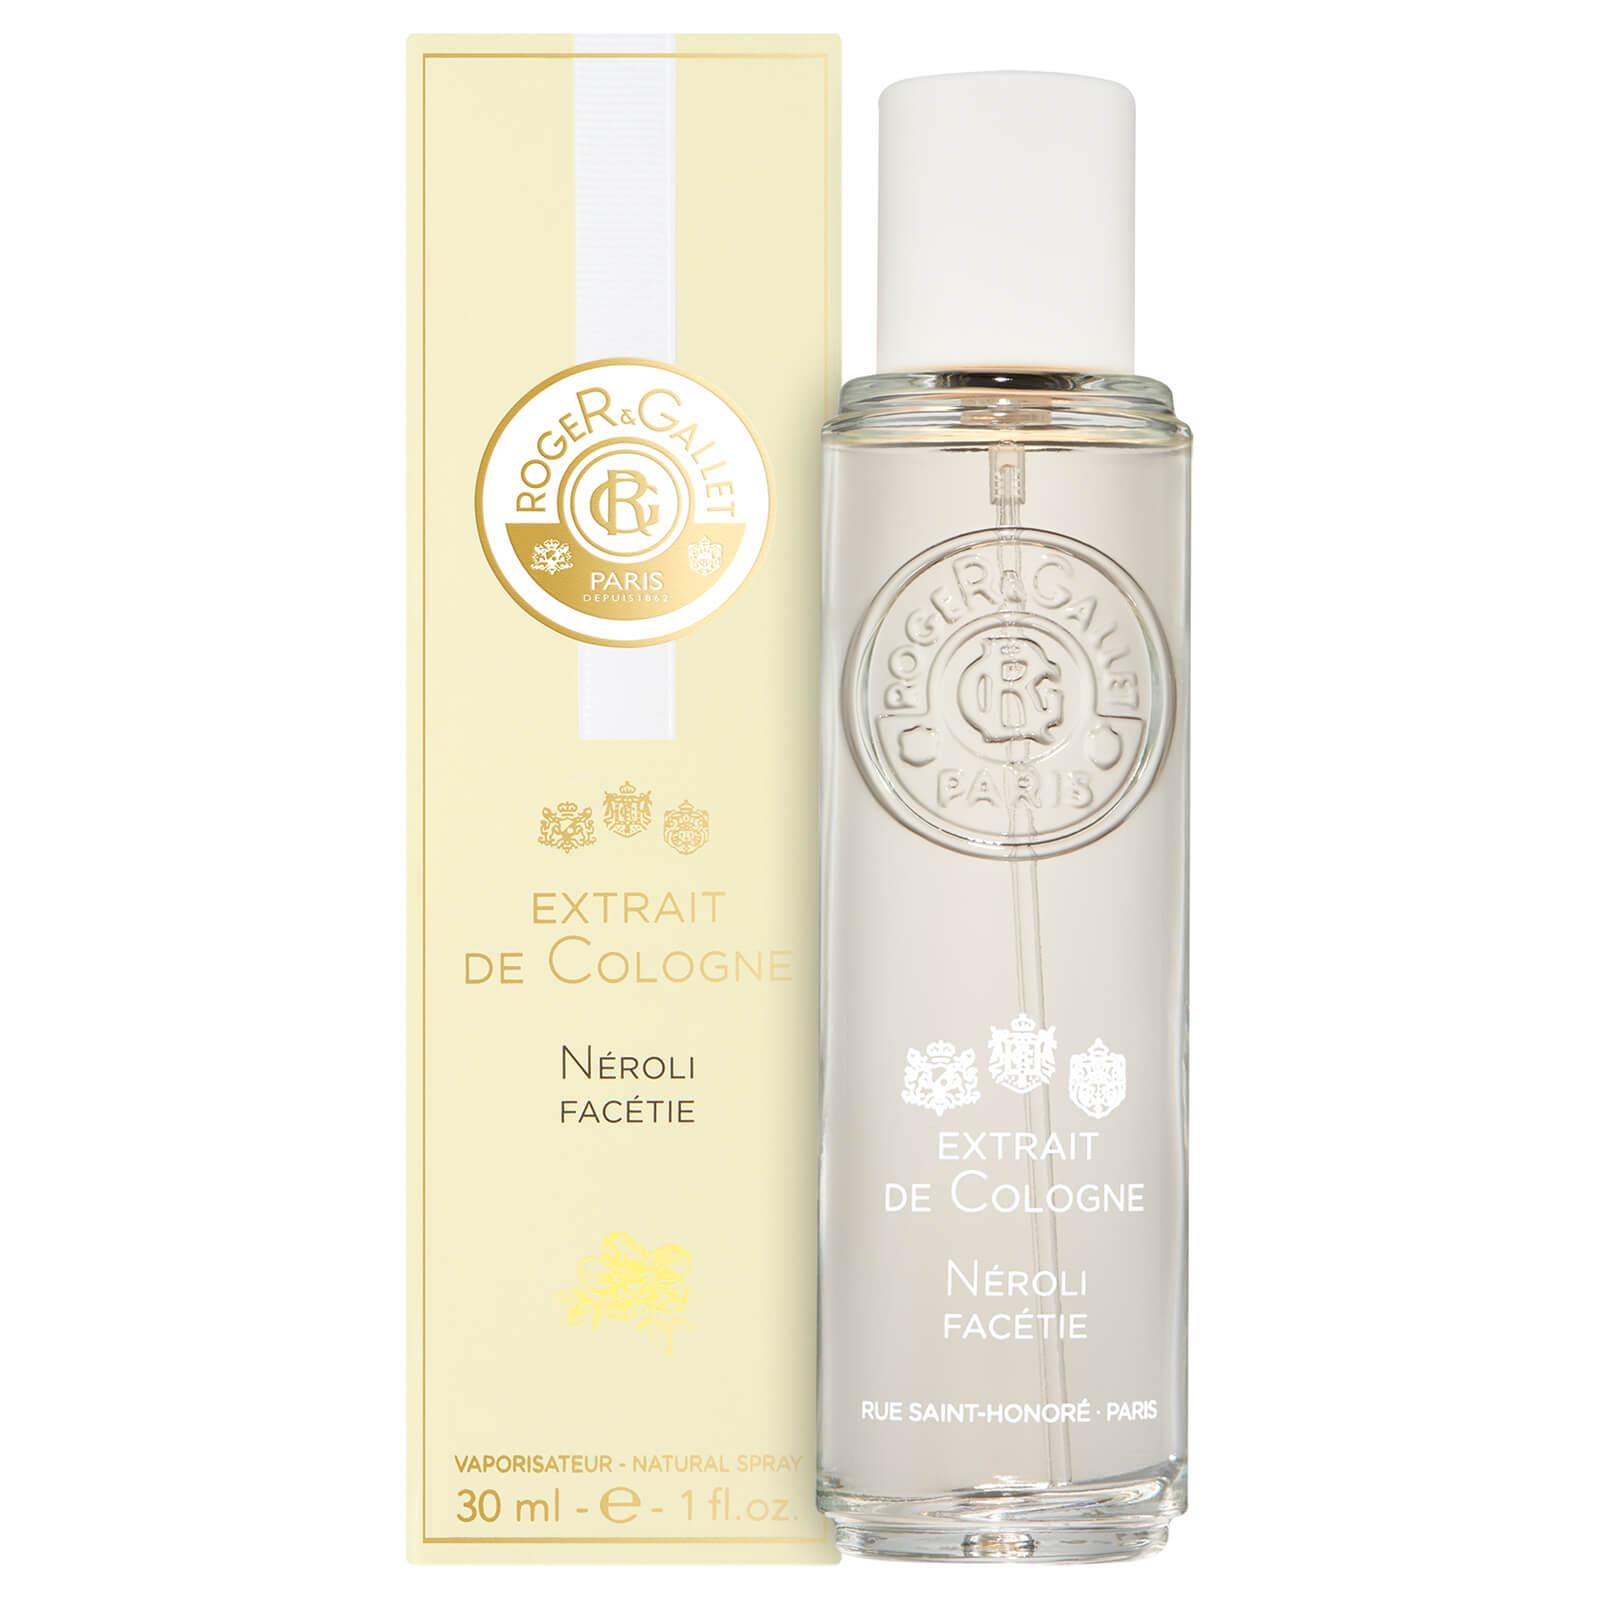 Roger&Gallet Extrait De Cologne Neroli Facetie Fragrance 30ml